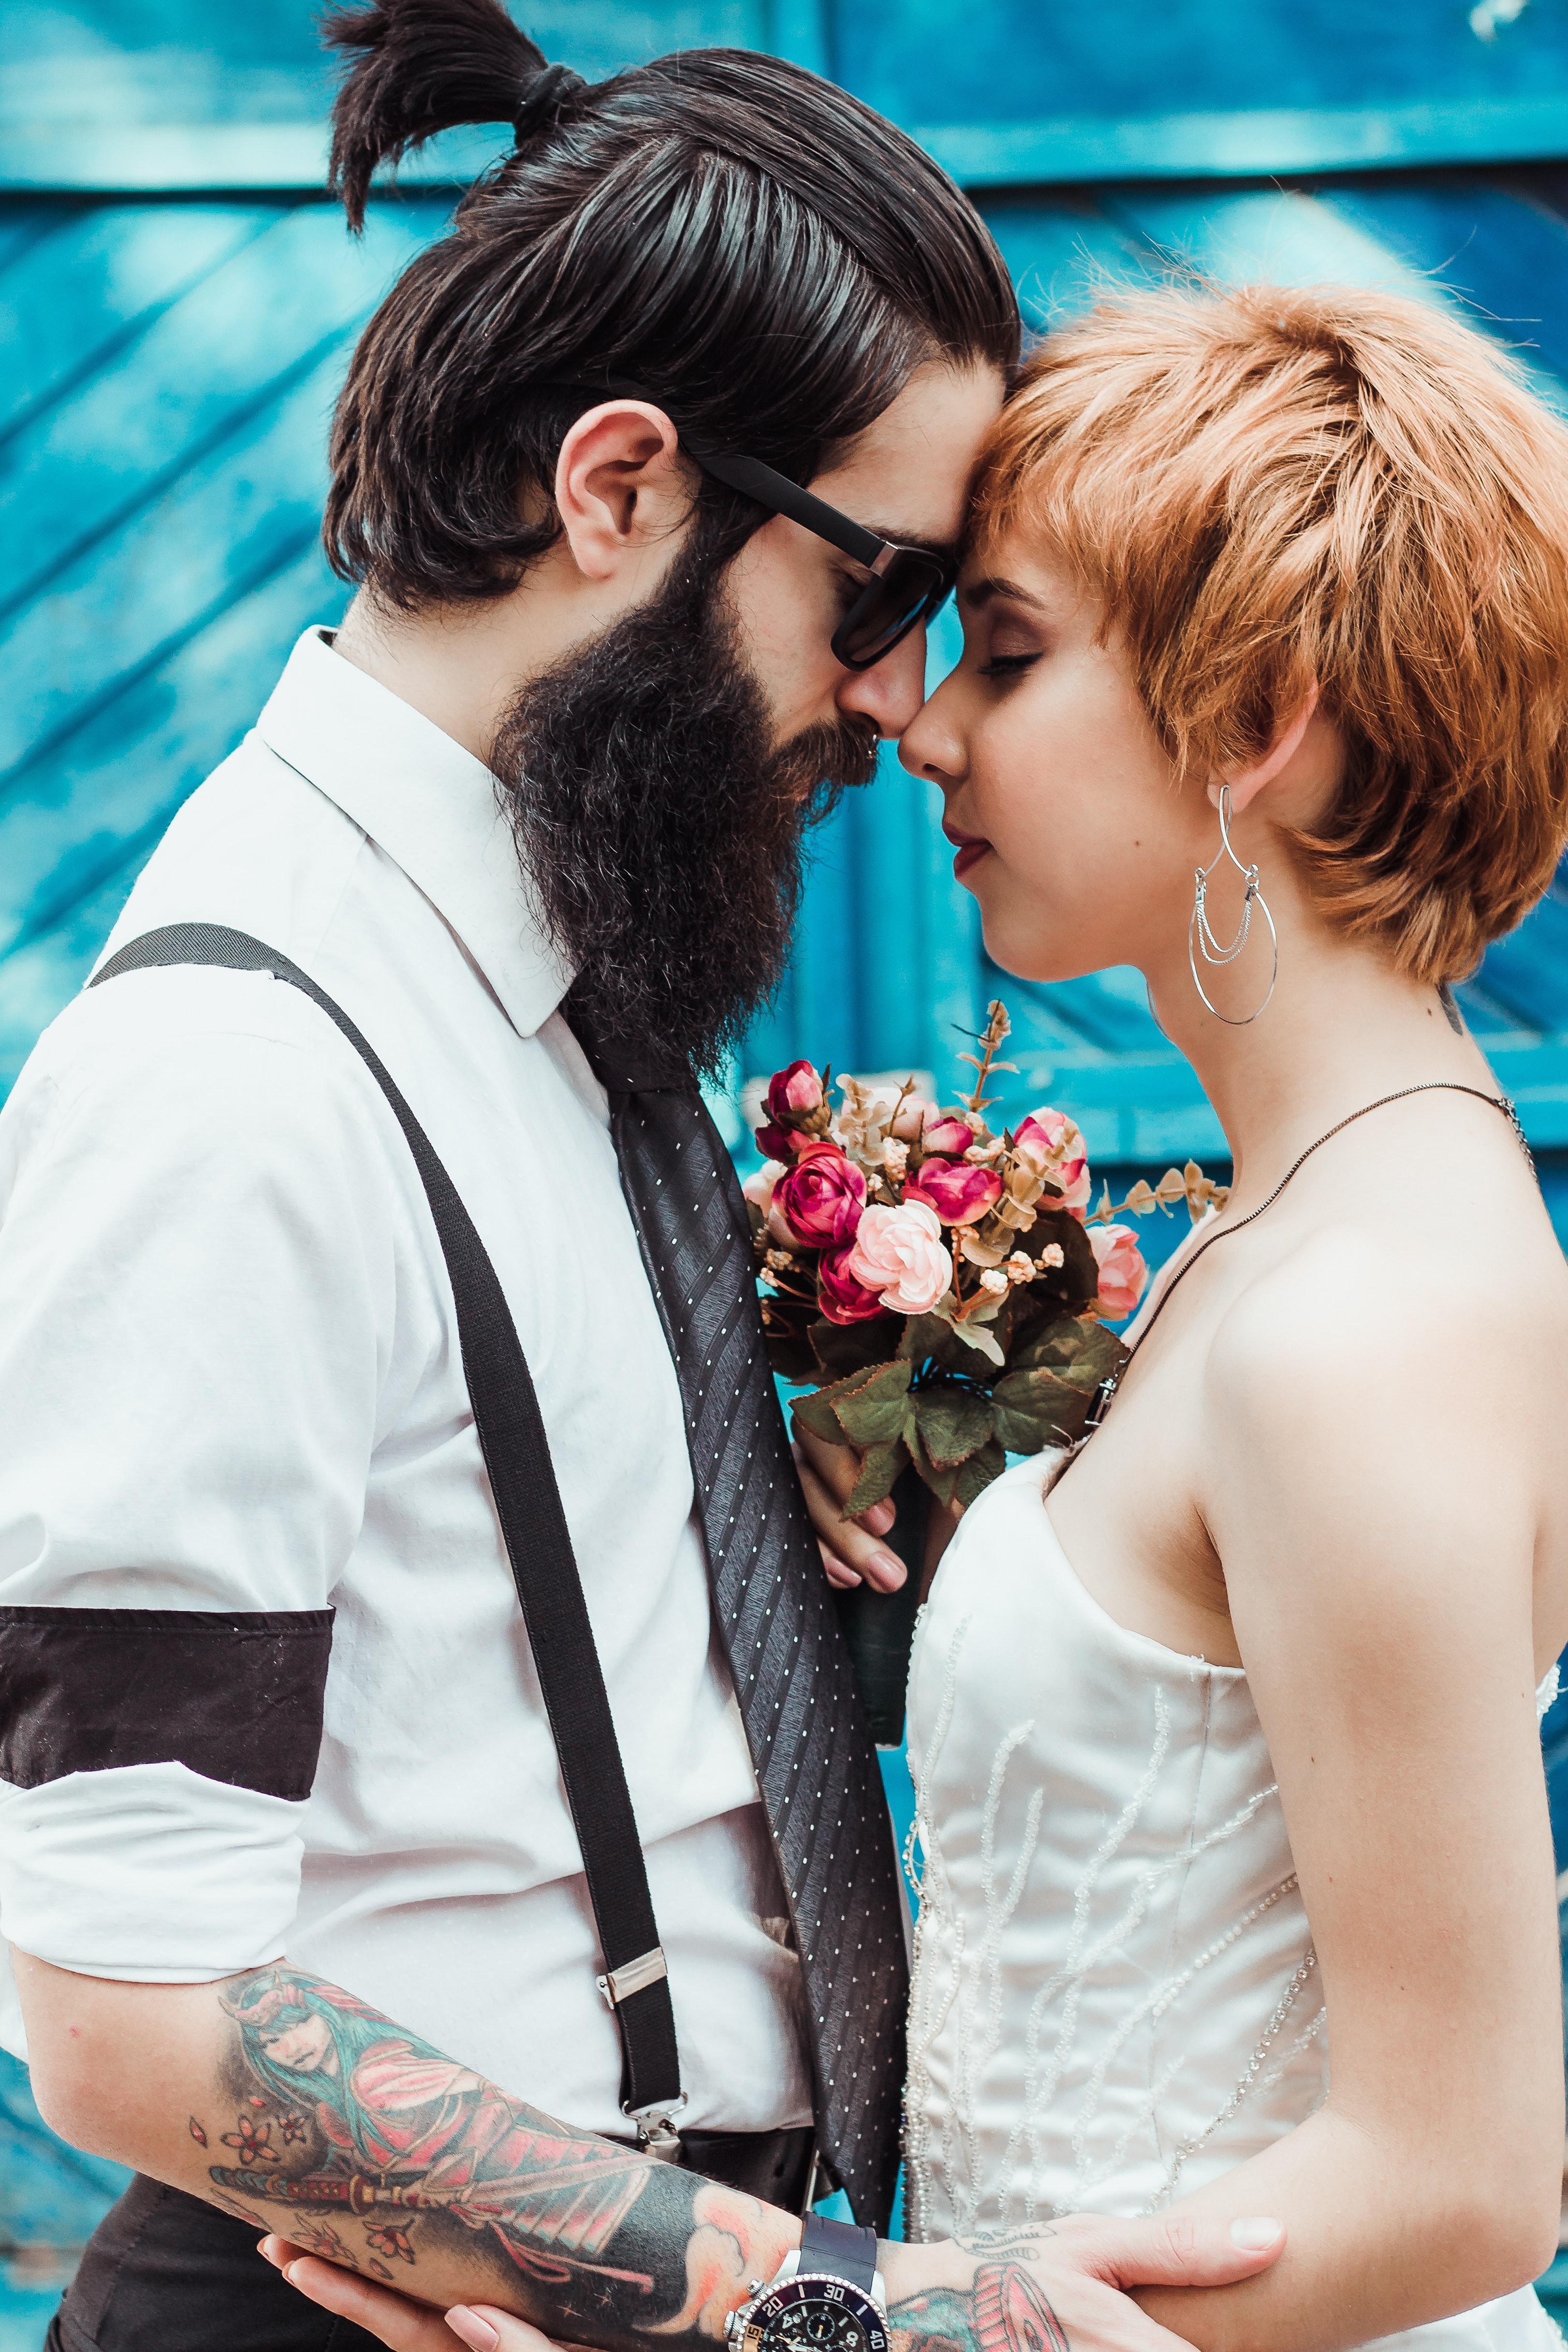 man-in-necktie-and-dress-shirt-standing-